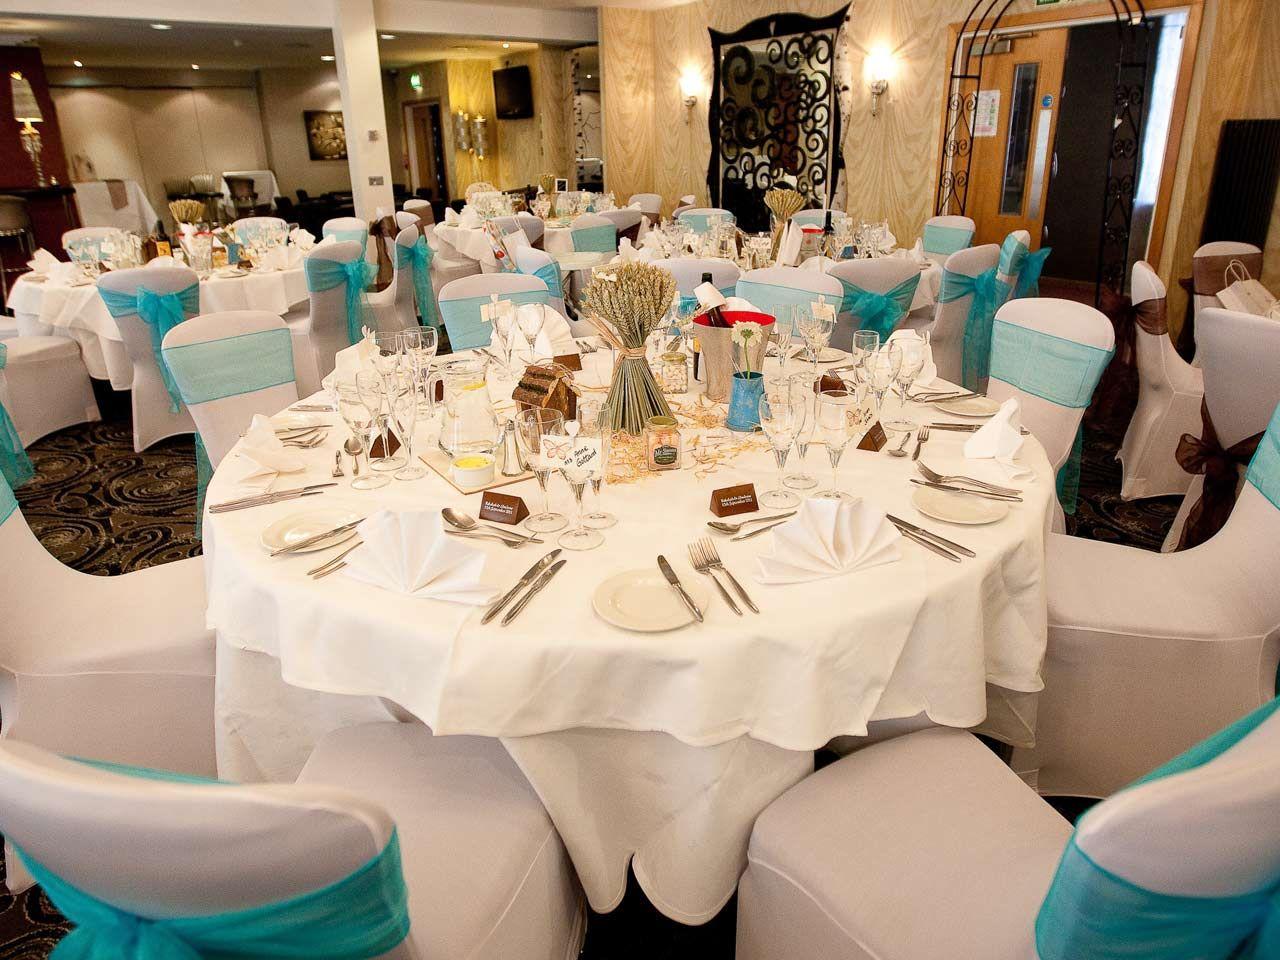 How to properly arrange wedding seating chart 60 inch round table how to properly arrange wedding seating chart junglespirit Choice Image